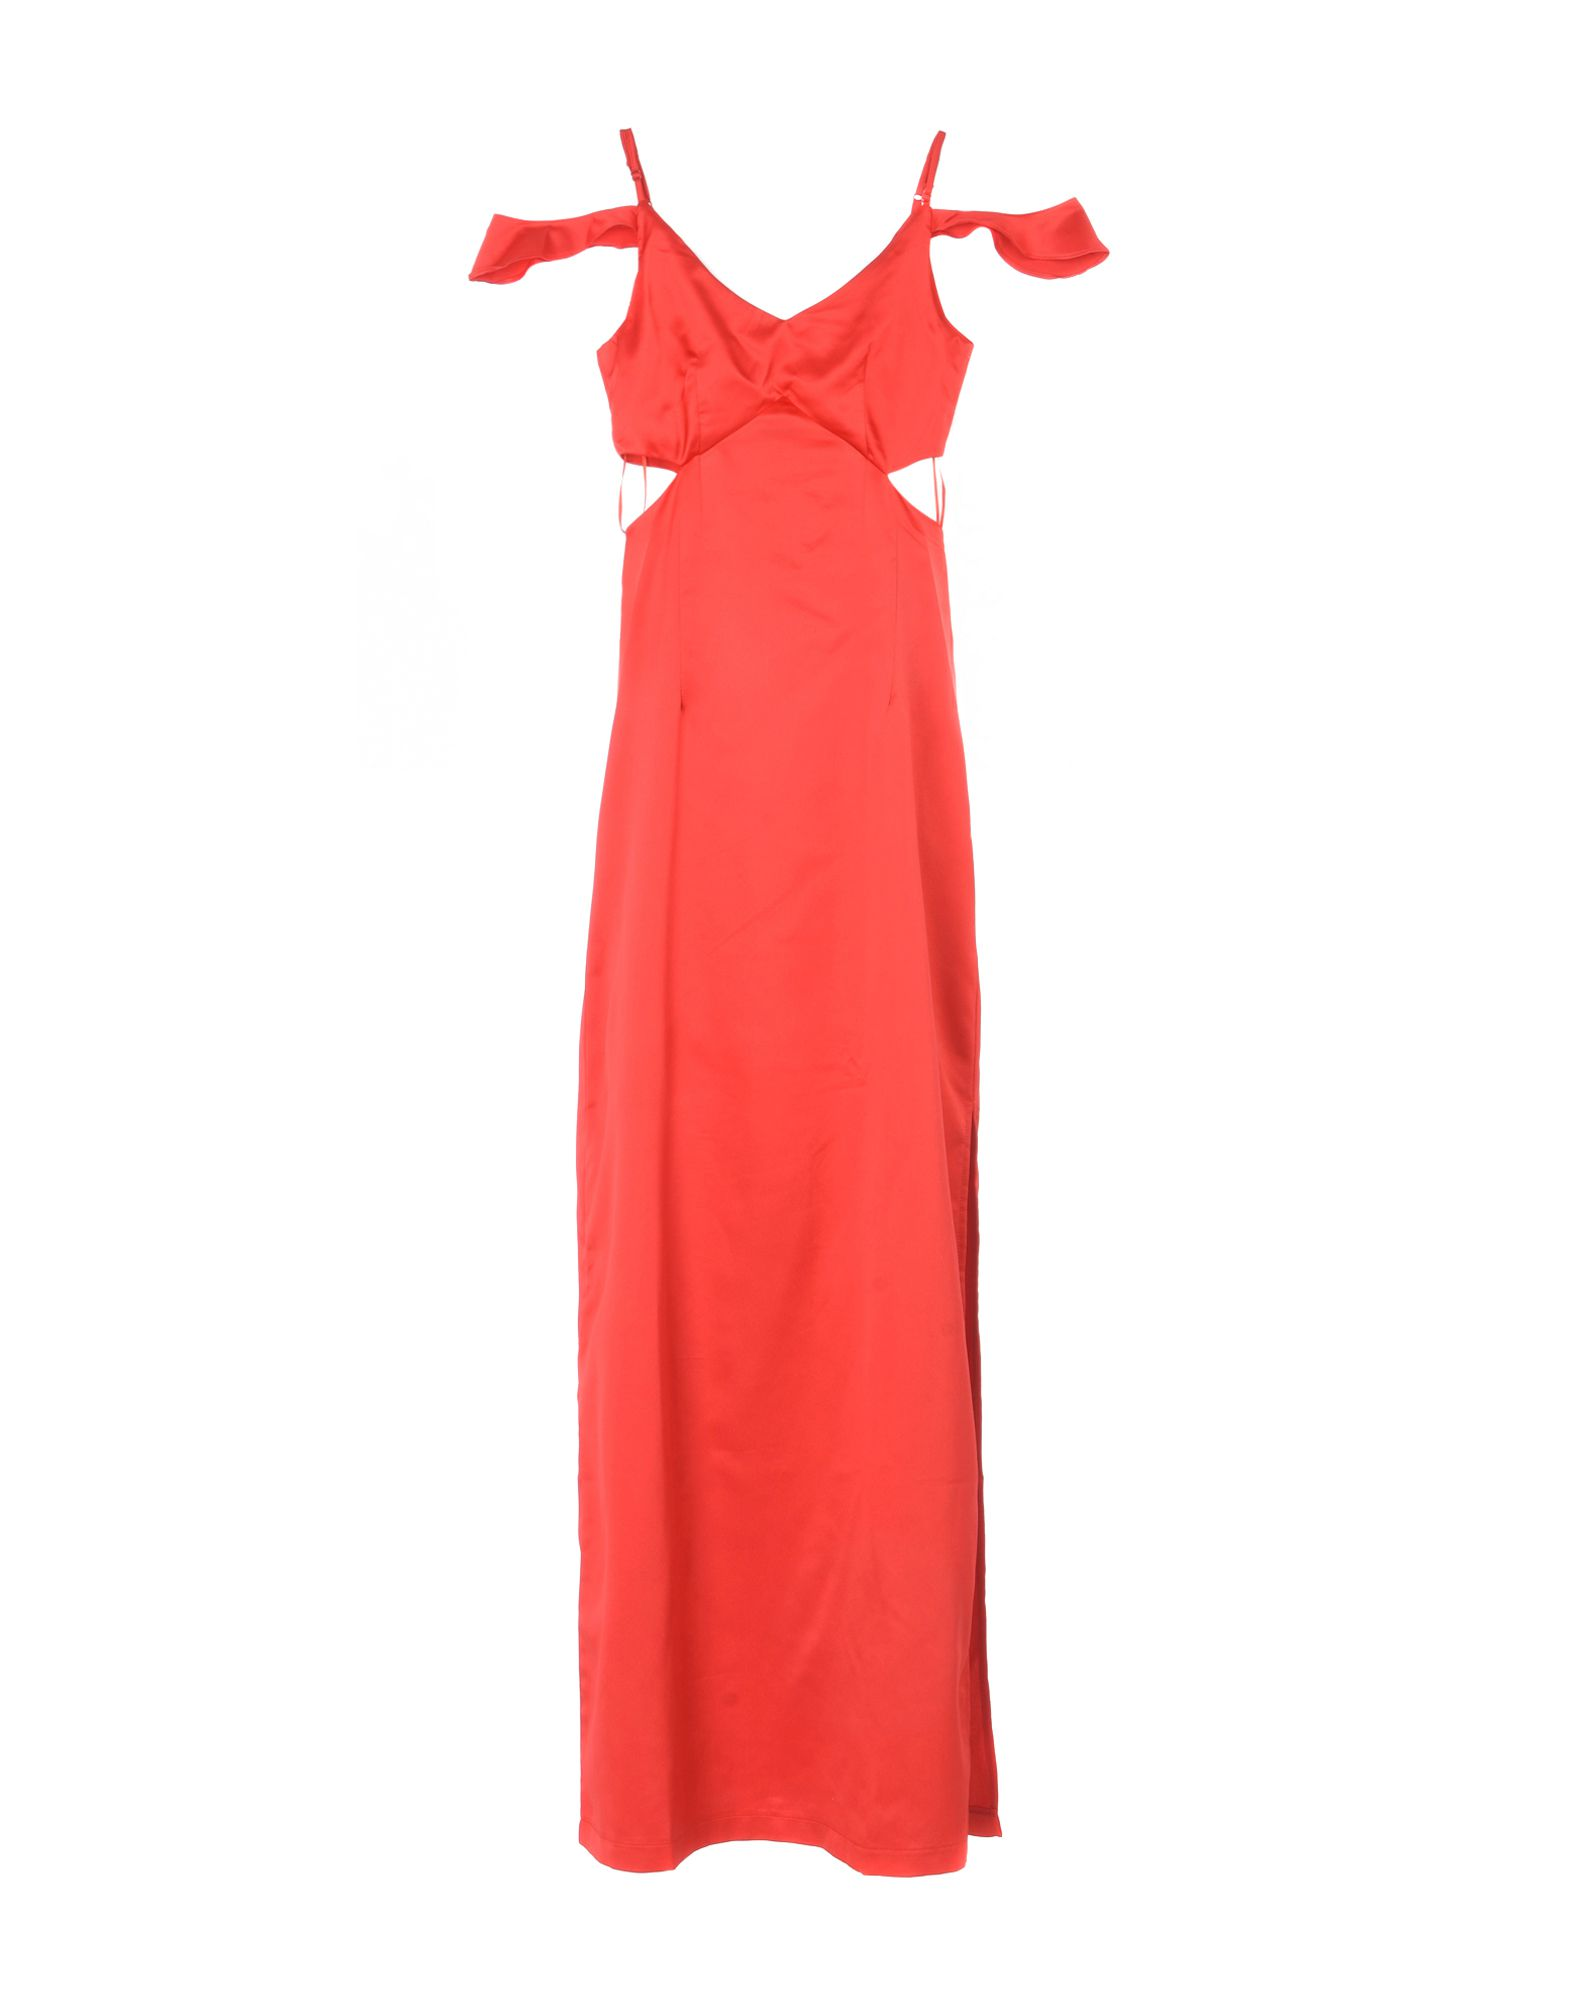 WYLDR Long Dress in Red